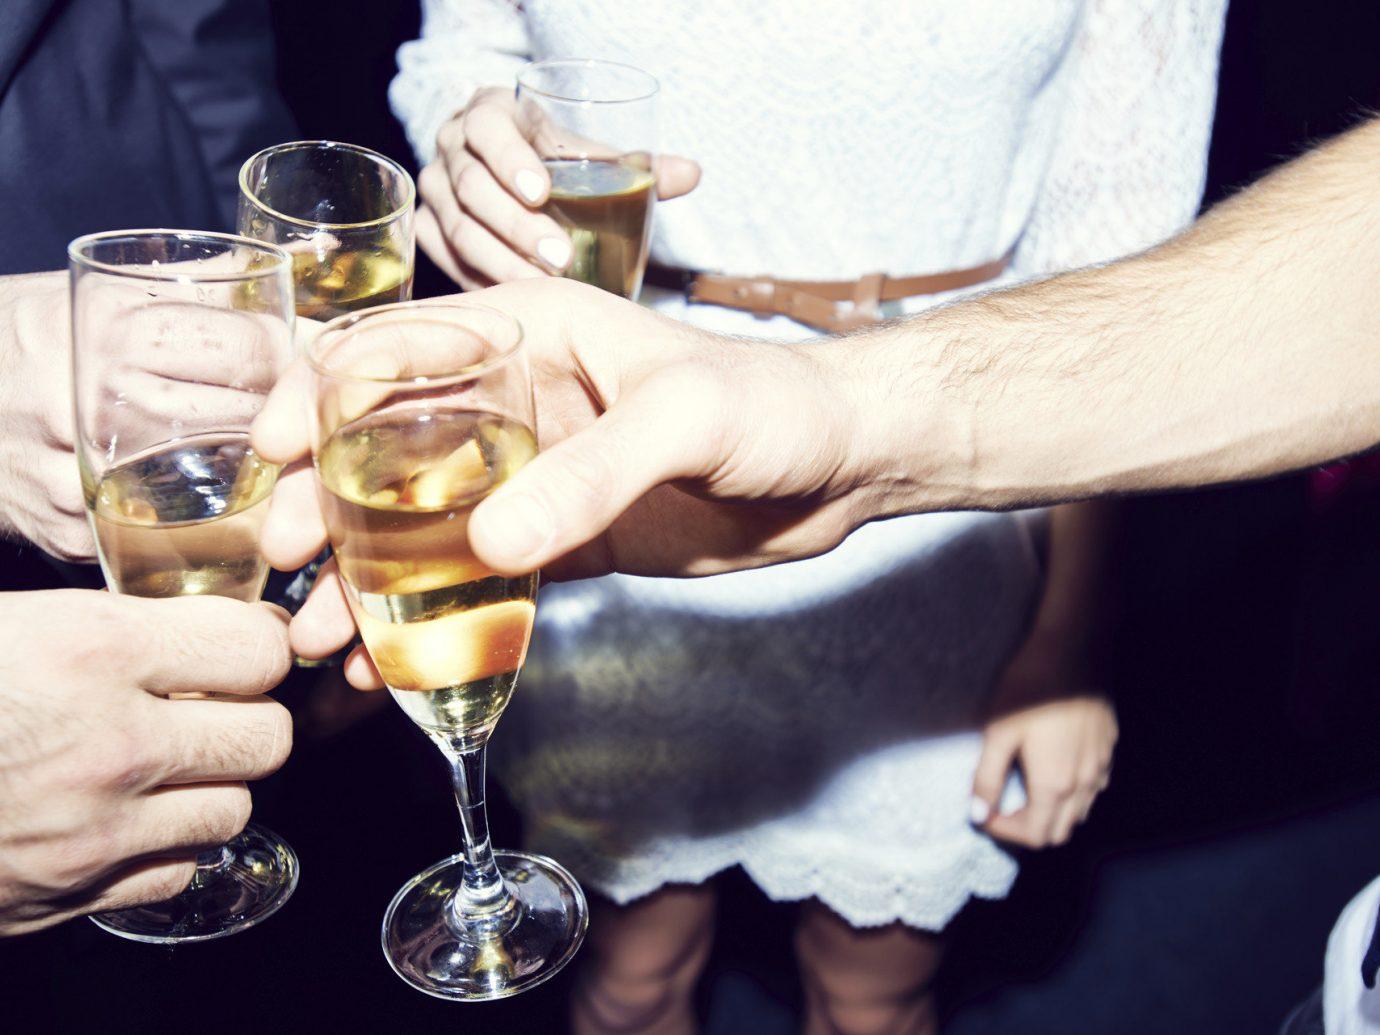 Trip Ideas person wine table glasses glass alcohol Drink wine glass hand sense stemware